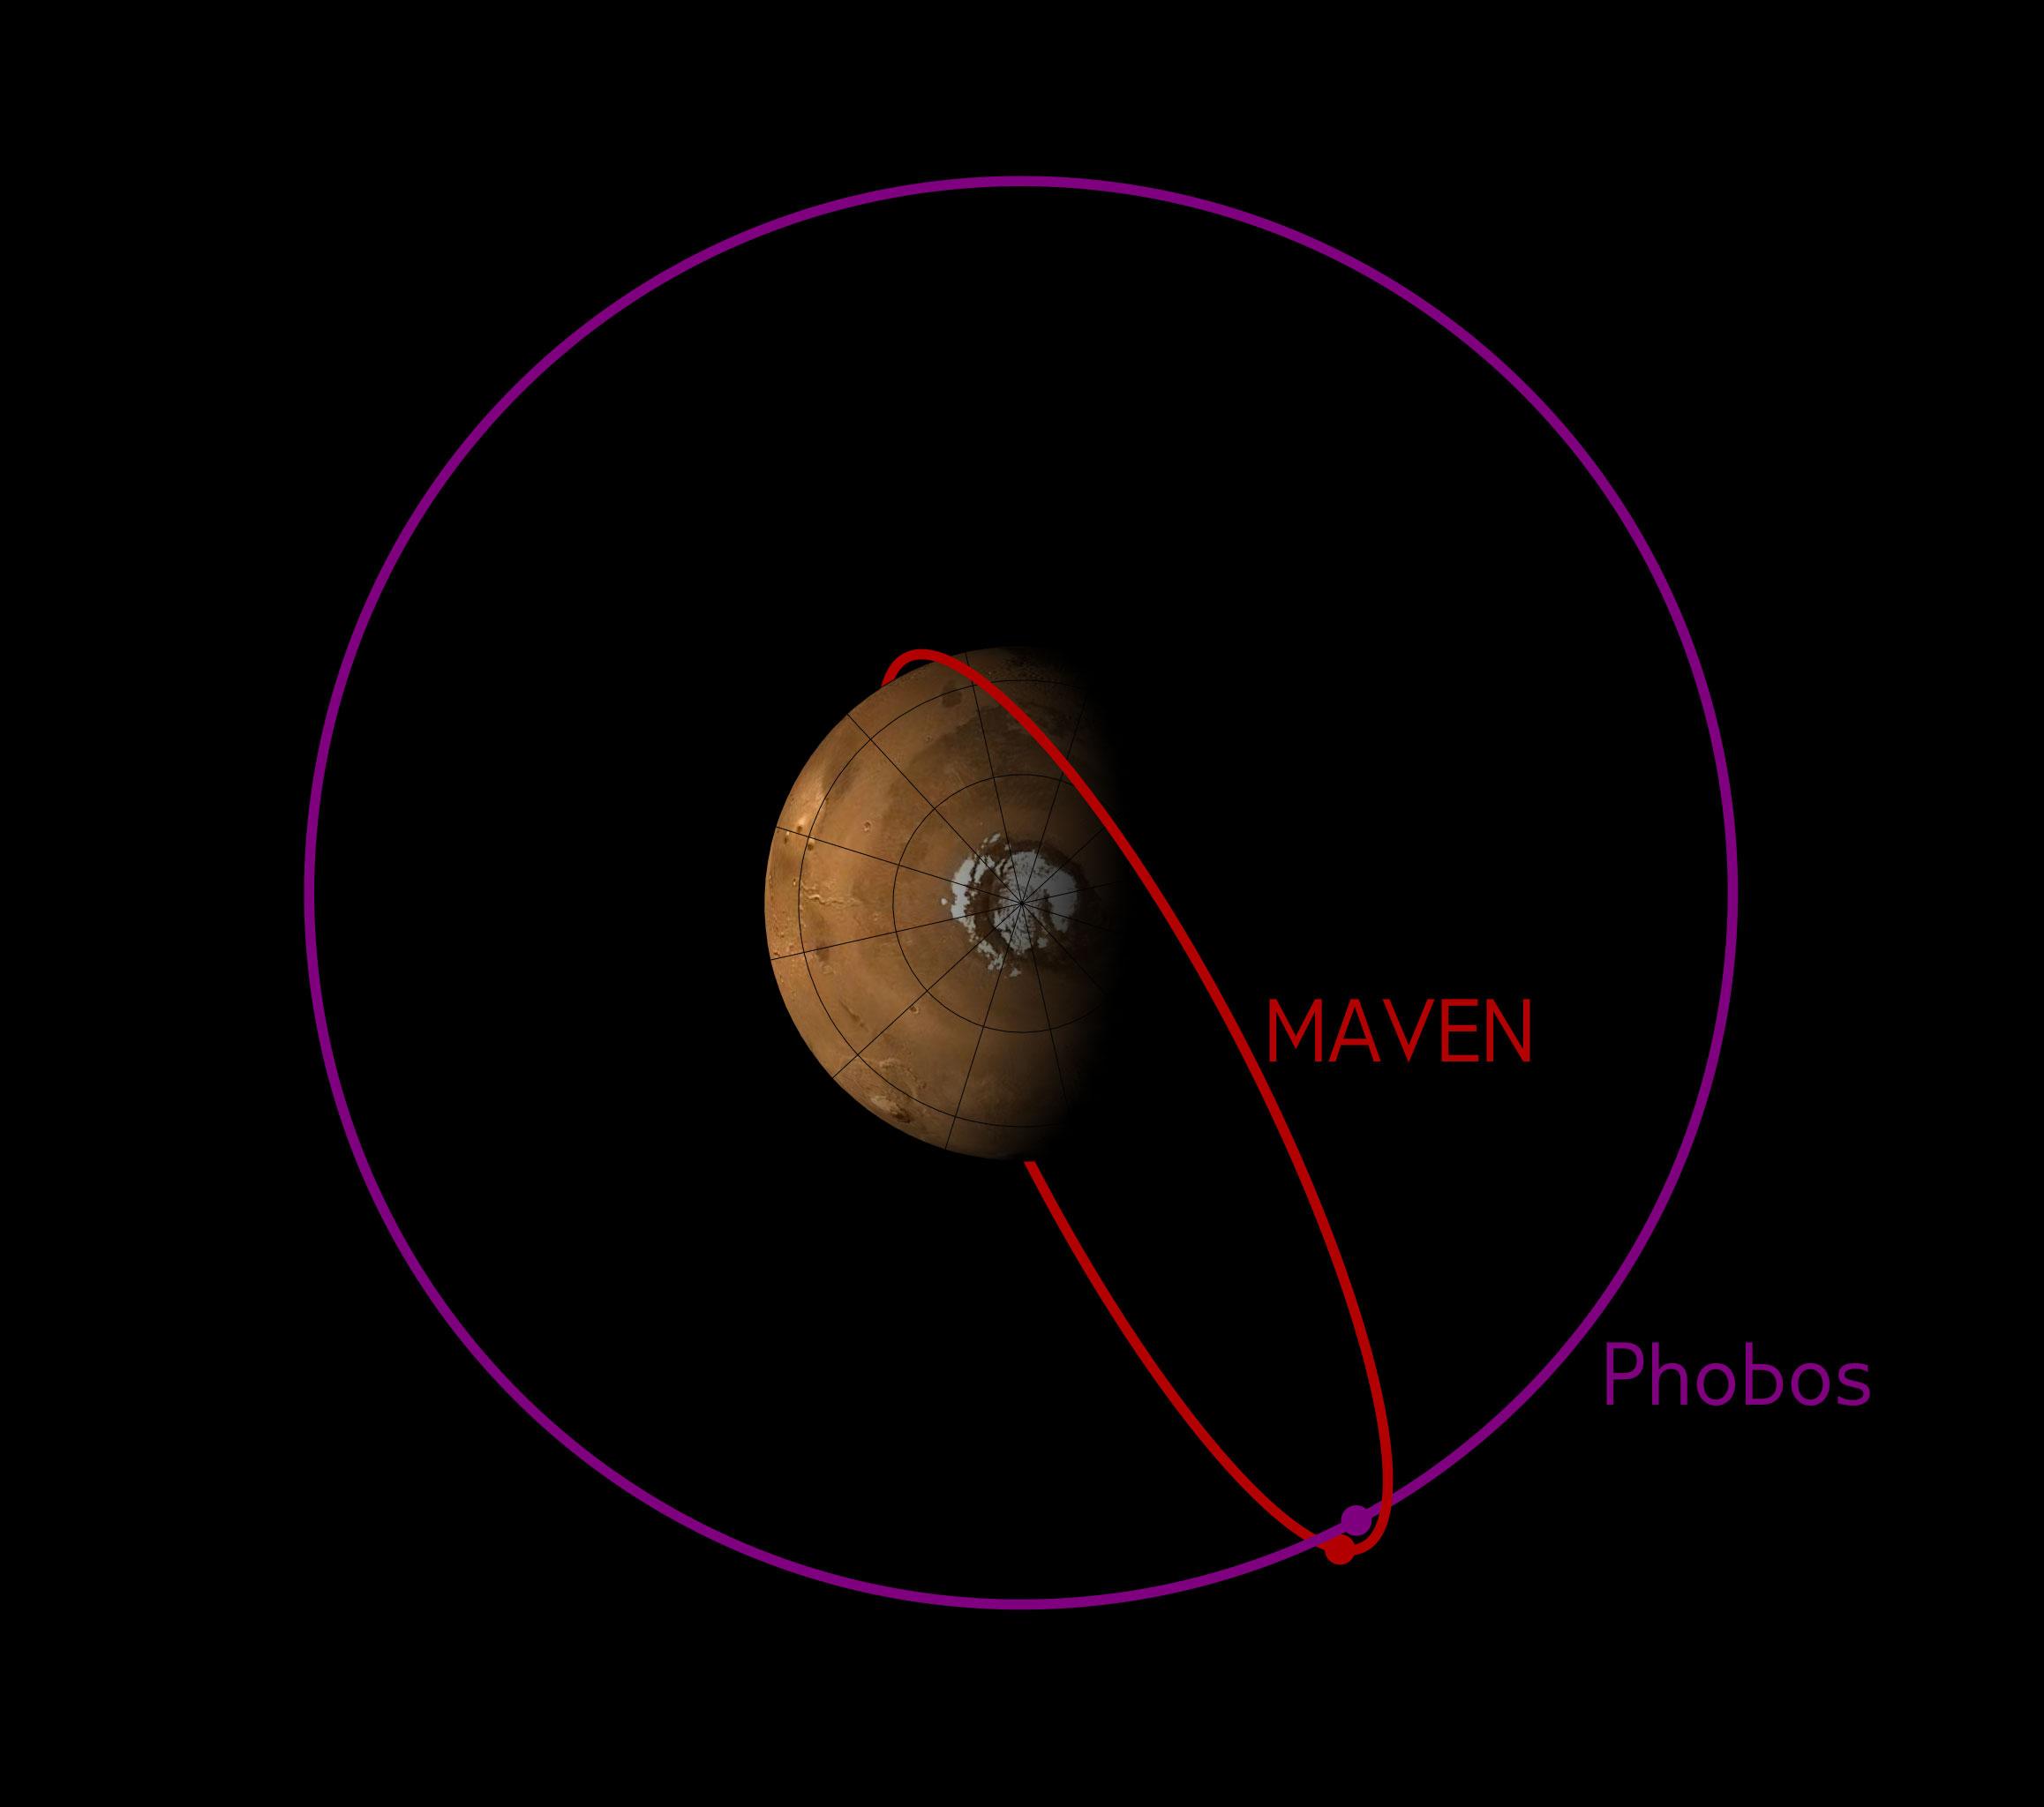 Orbit of MAVEN and Phobos – NASA's Mars Exploration Program